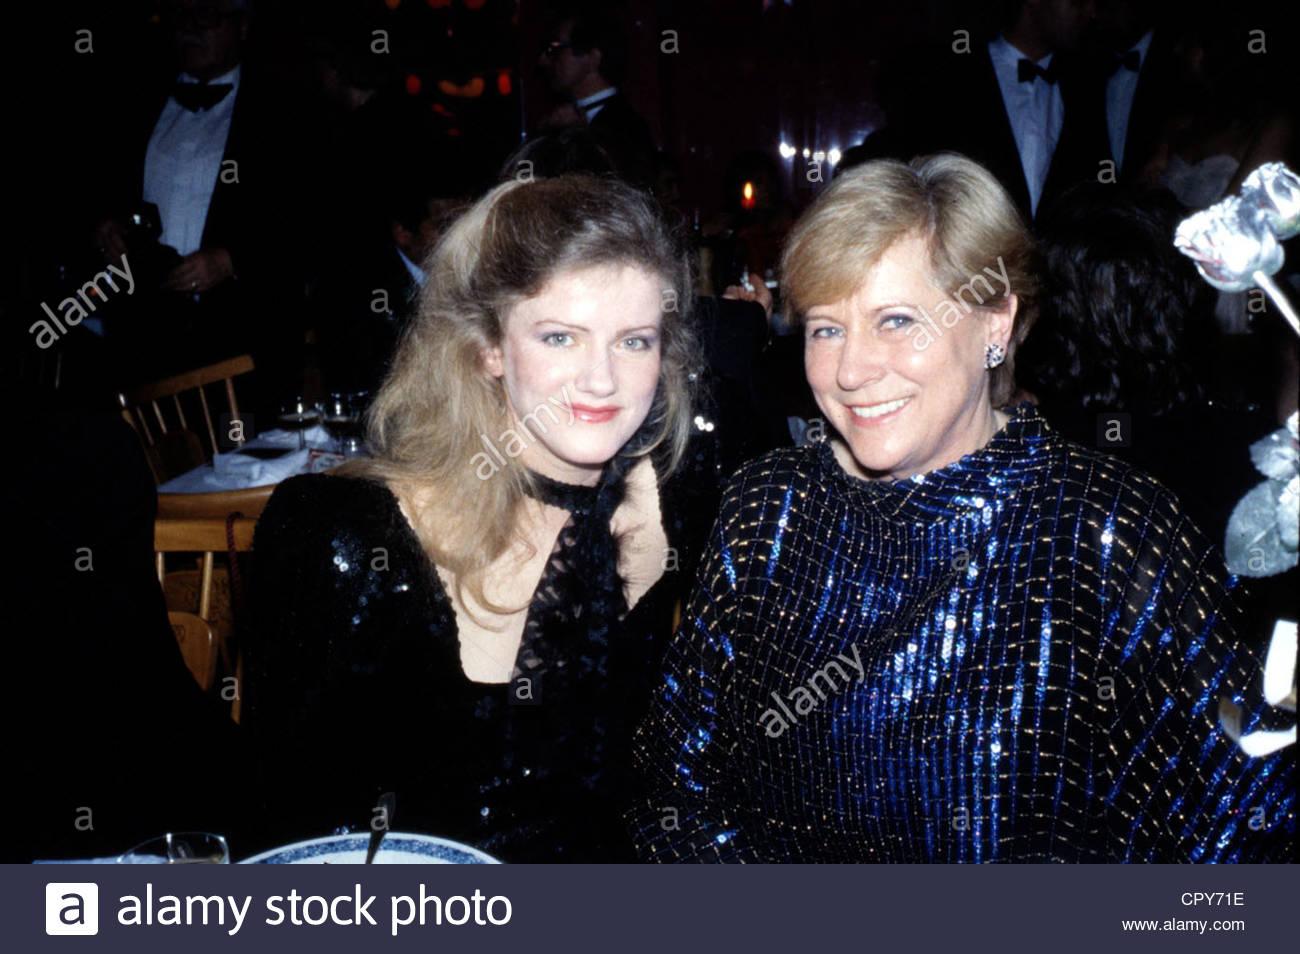 Sukowa, Barbara * 2.2.1950, German actress, portrait, with Margarete von Trotta, 1980s, sitting at table, evening - Stock Image